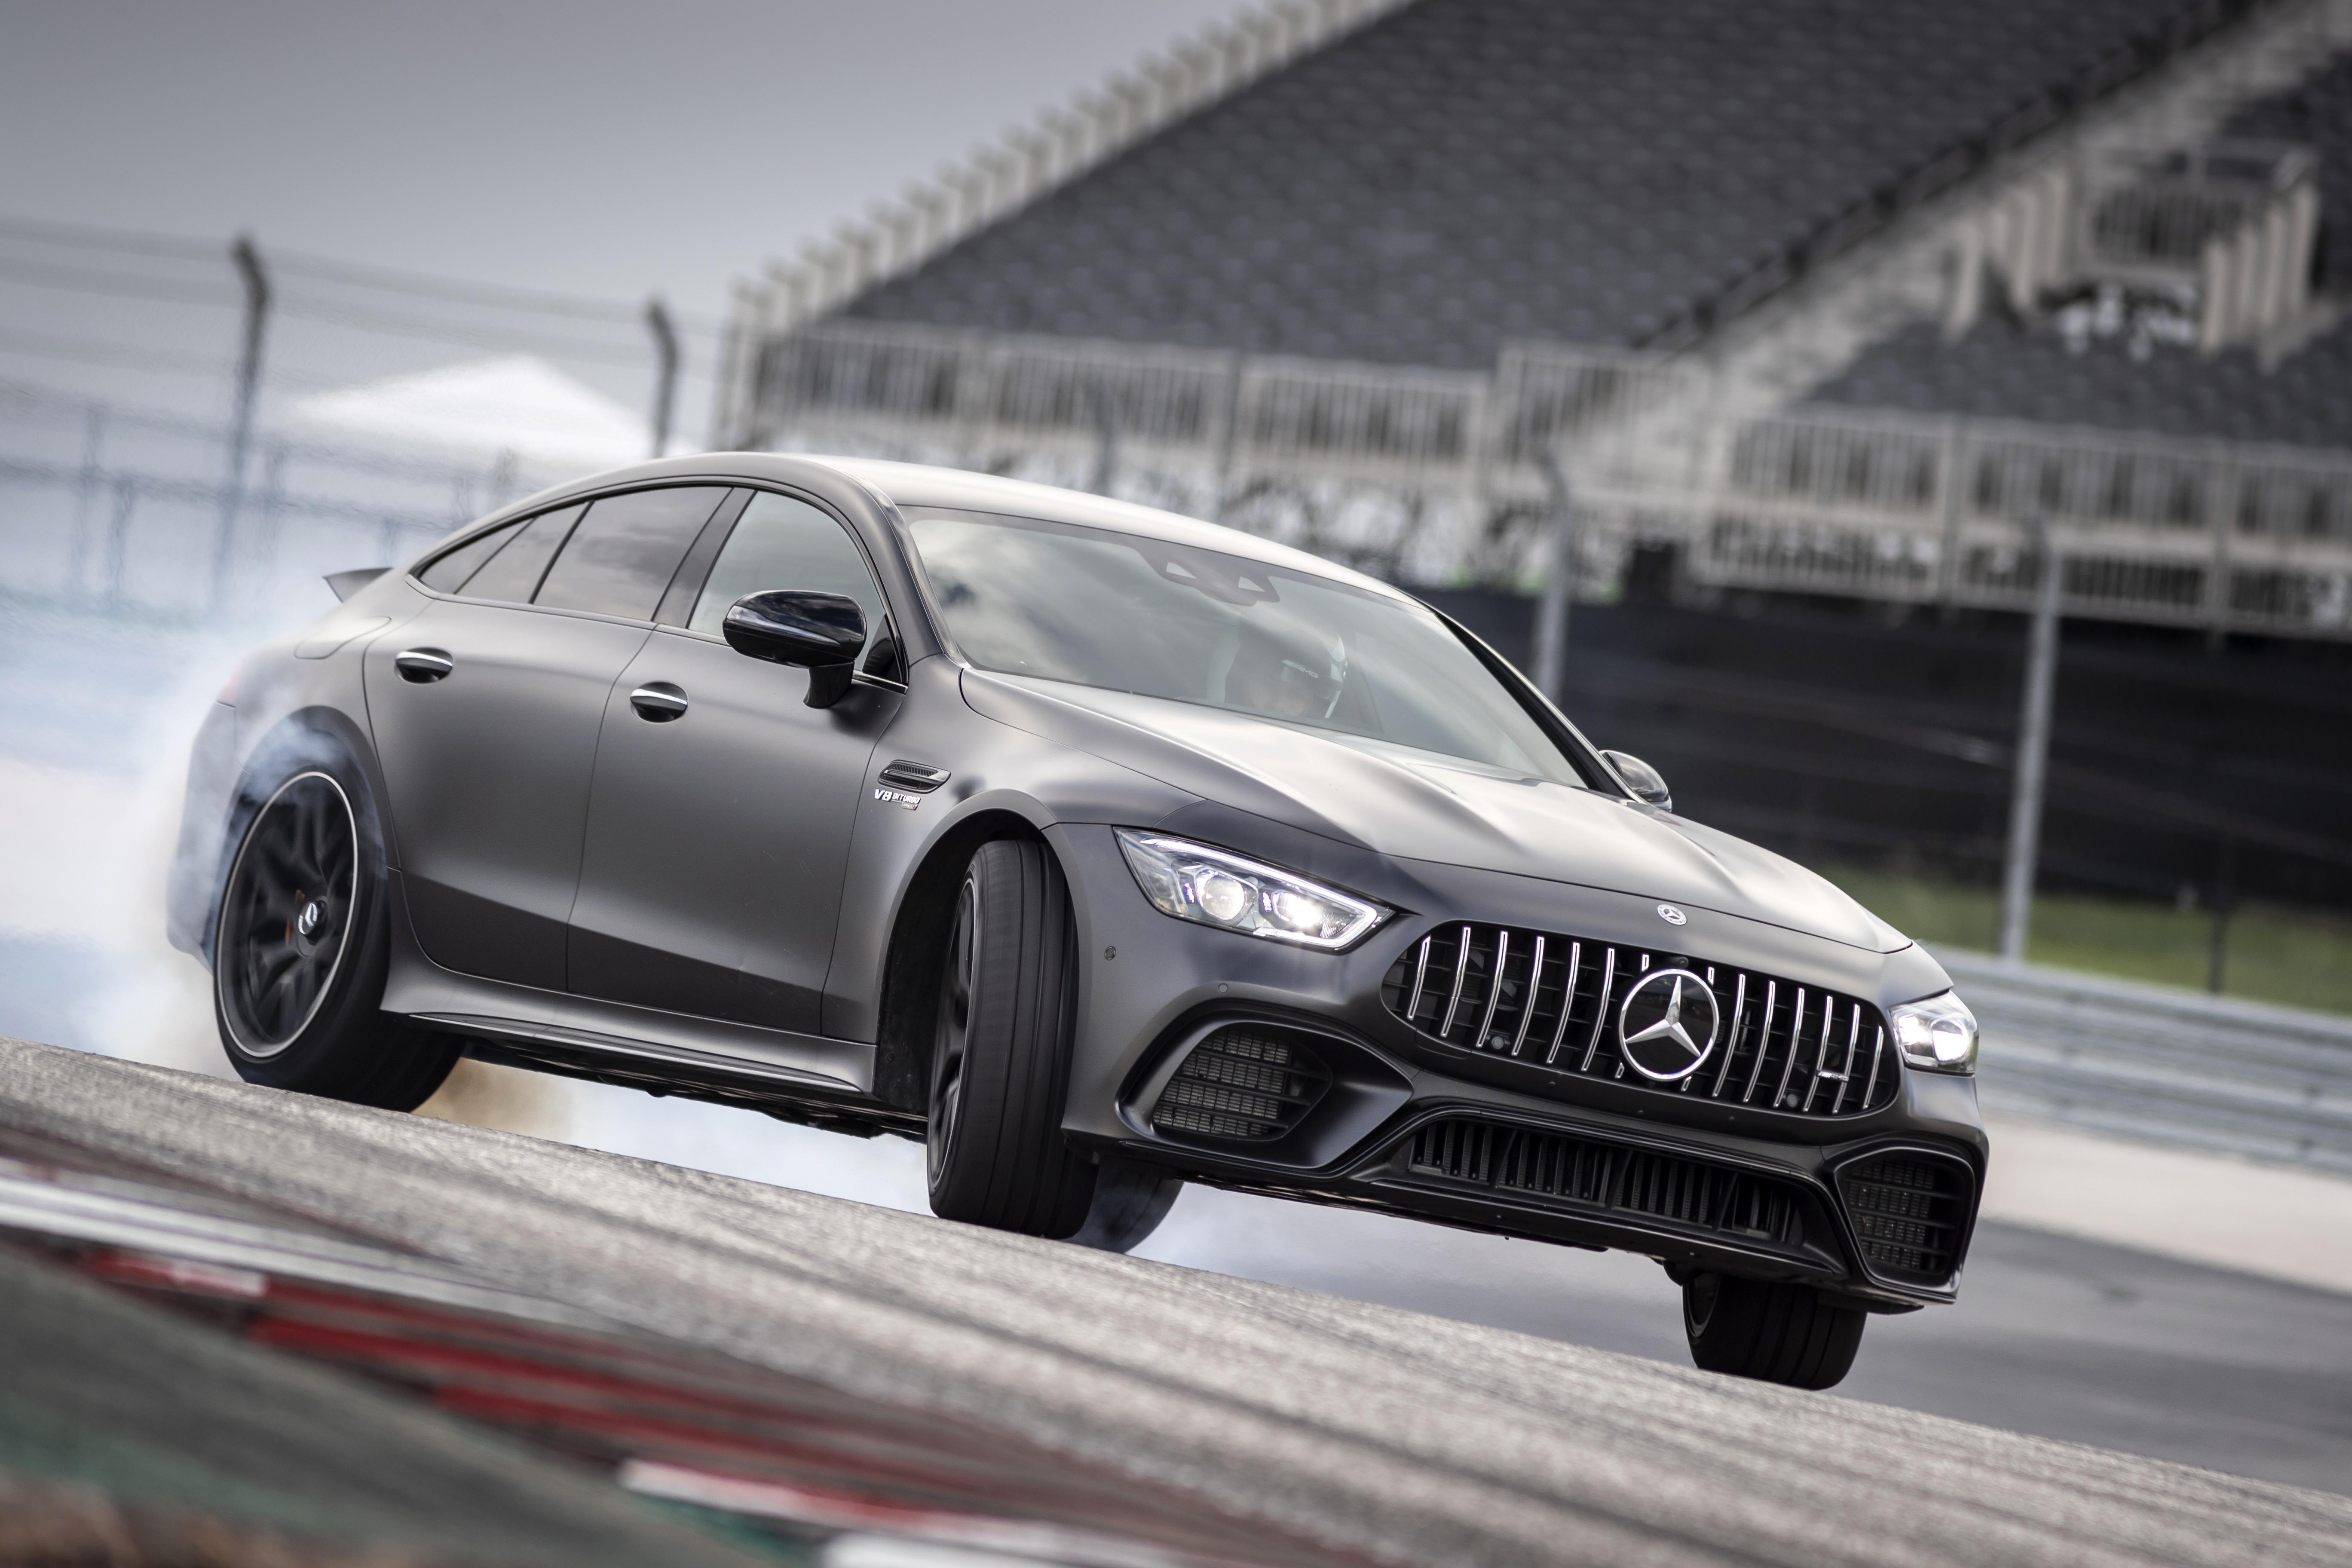 Mercedes-AMG GT 63 S 4MATIC+ 4-Door Coupé. Austin 2018  Mercedes-AMG GT 63 S 4MATIC+ 4-Door Coupé. Austin 2018